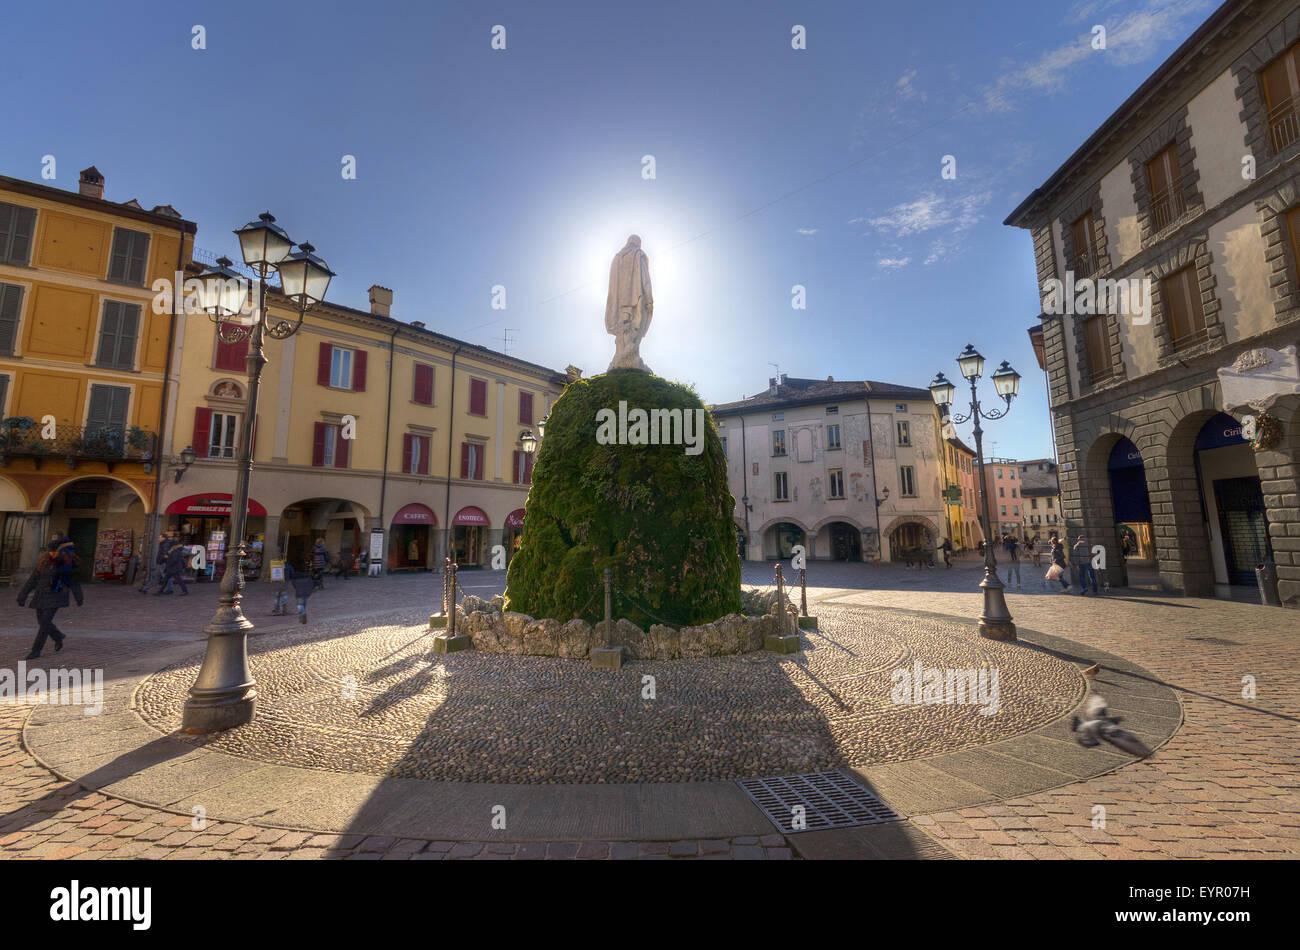 Italy, Lombardy, Lago DIseo, Iseo, Garibaldi square - Stock Image